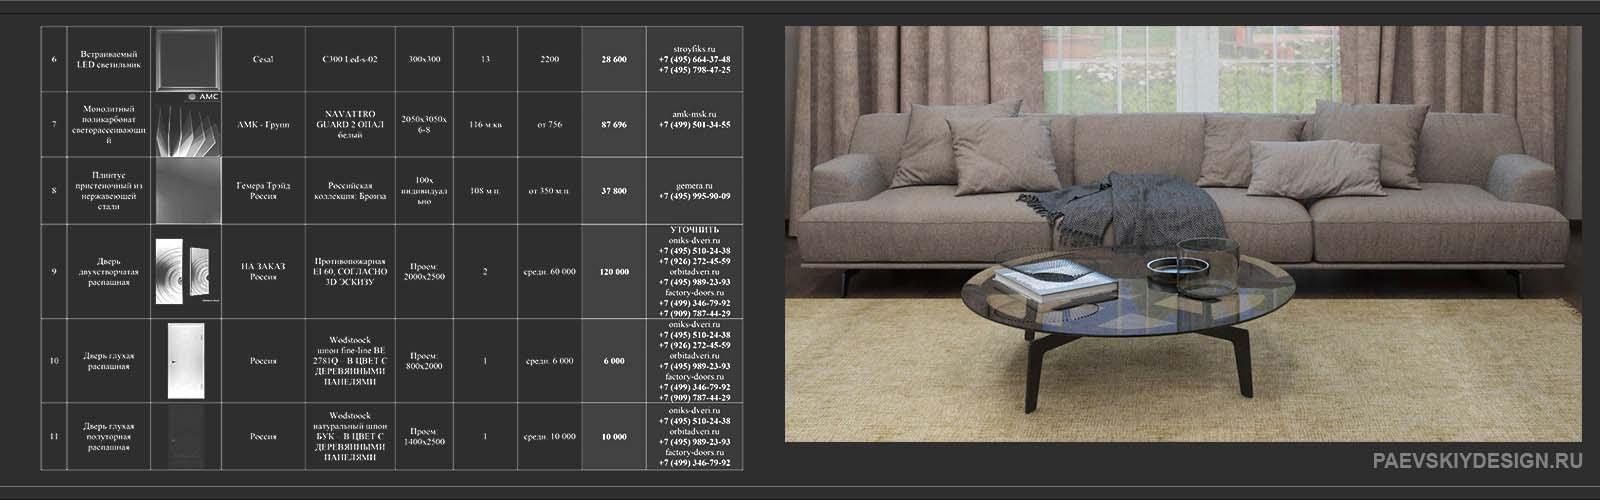 Подбор мебели, материалов, декора - Комплектация объекта